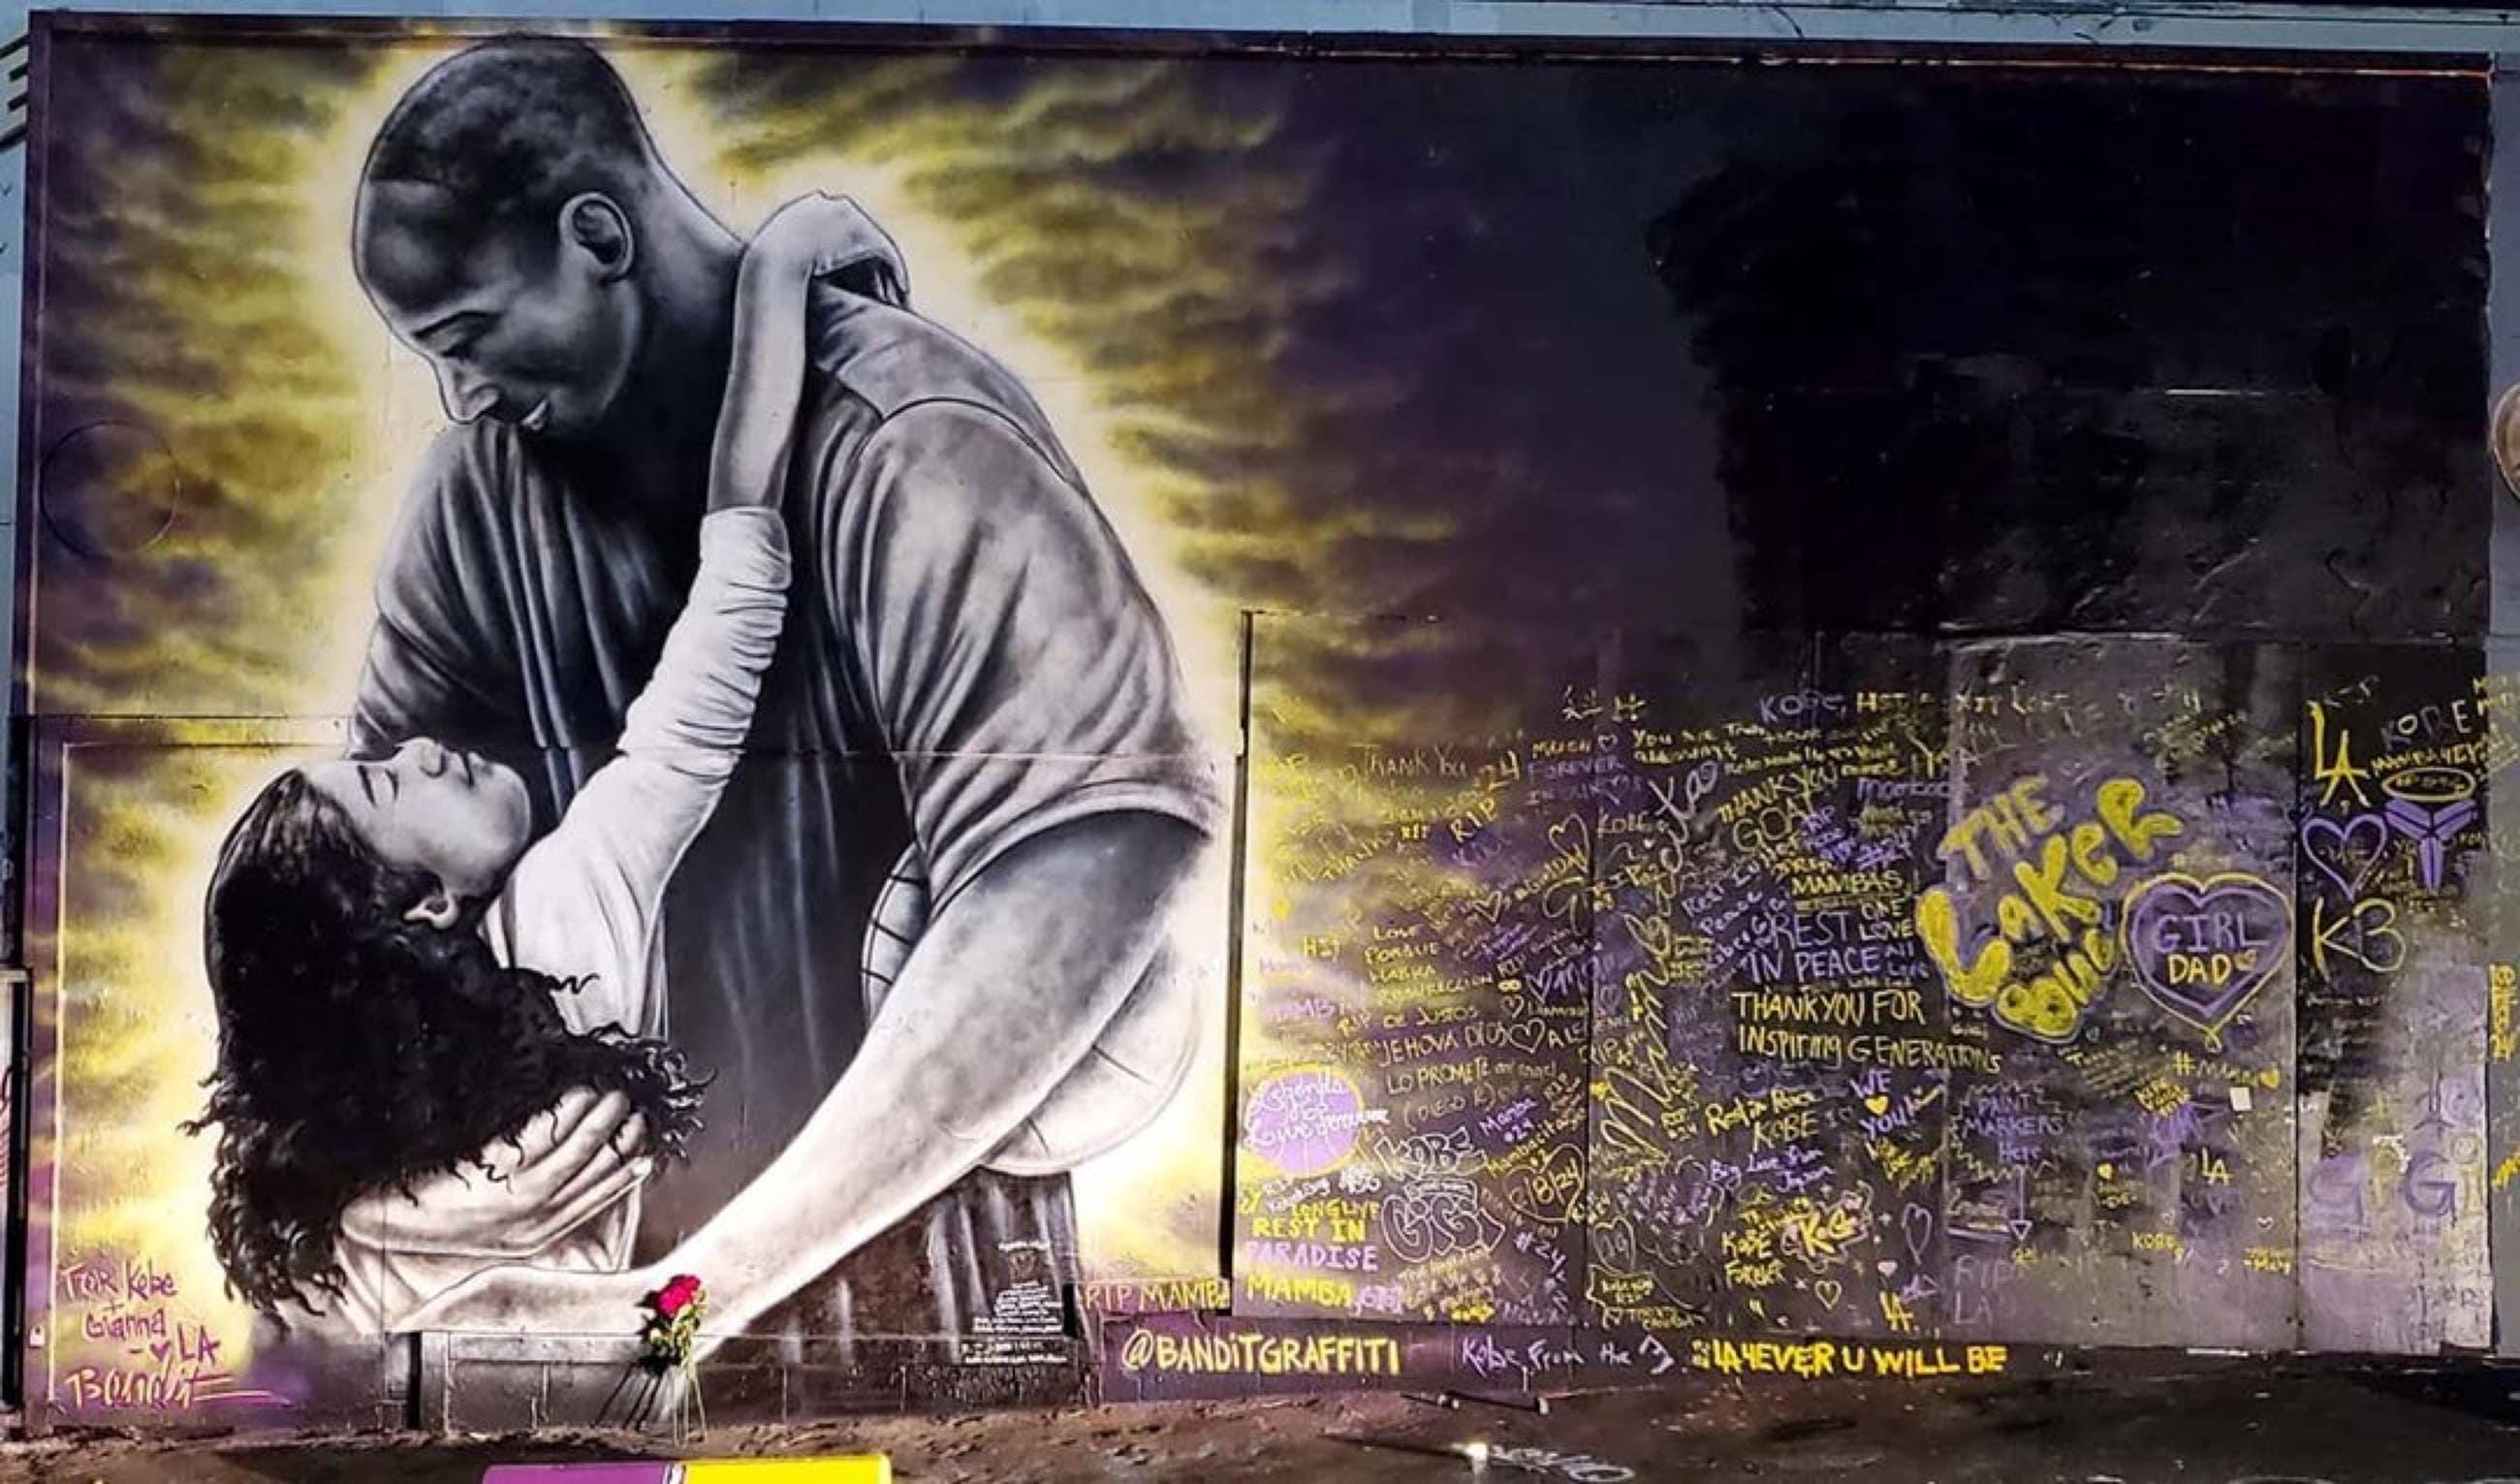 Kobe and Gianna Bryant mural by @banditgraffiti at Sportie LA on Melrose Avenue